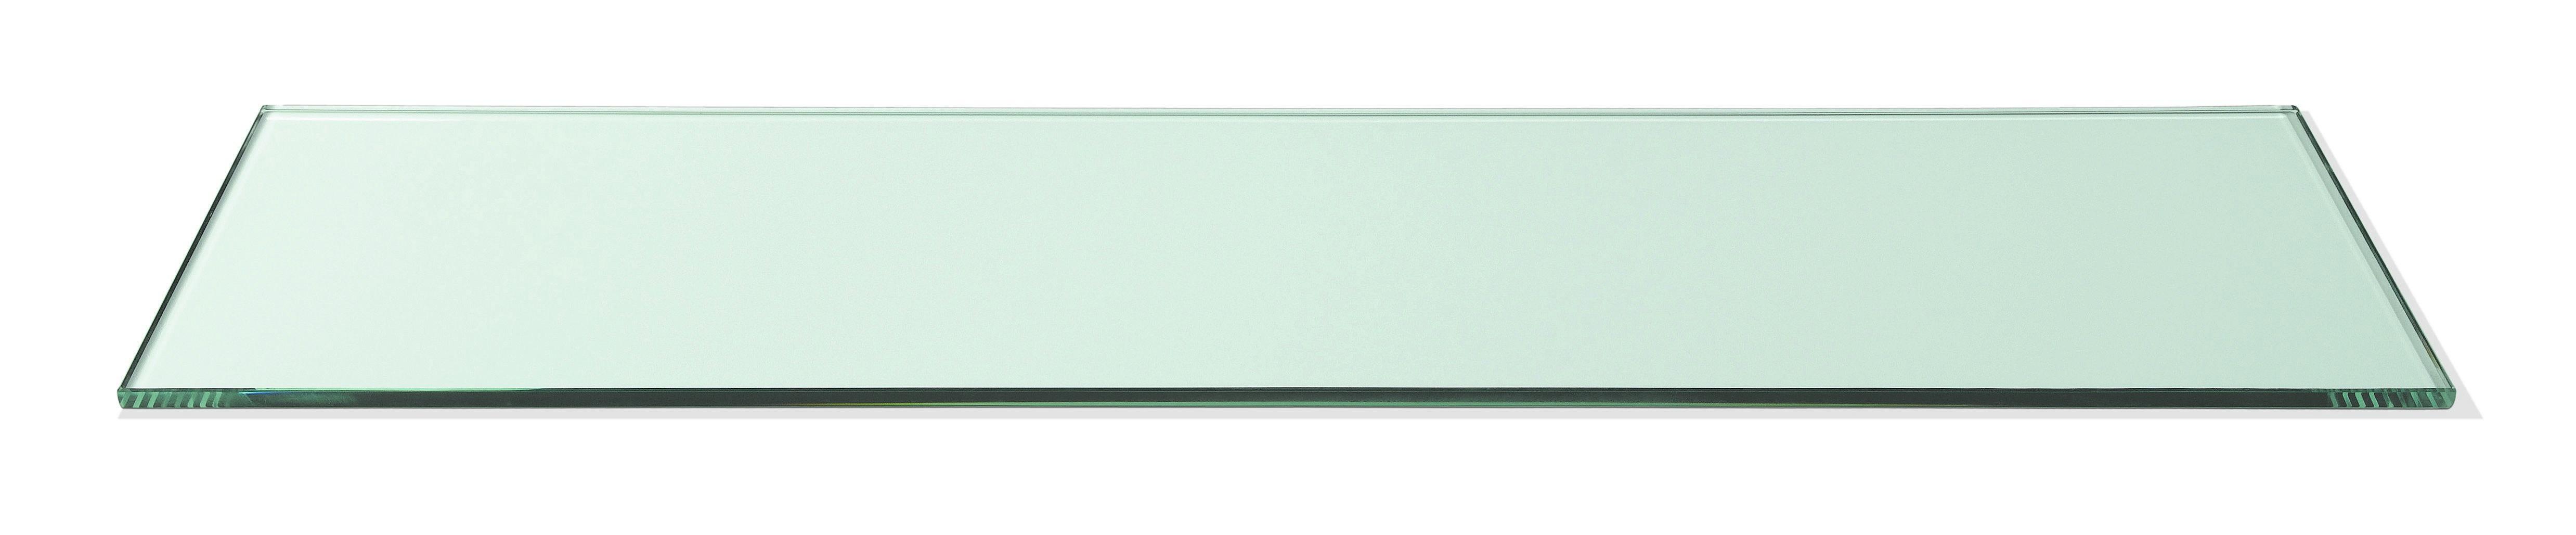 Rectangular Display Surface  Clear Acrylic - 33.5